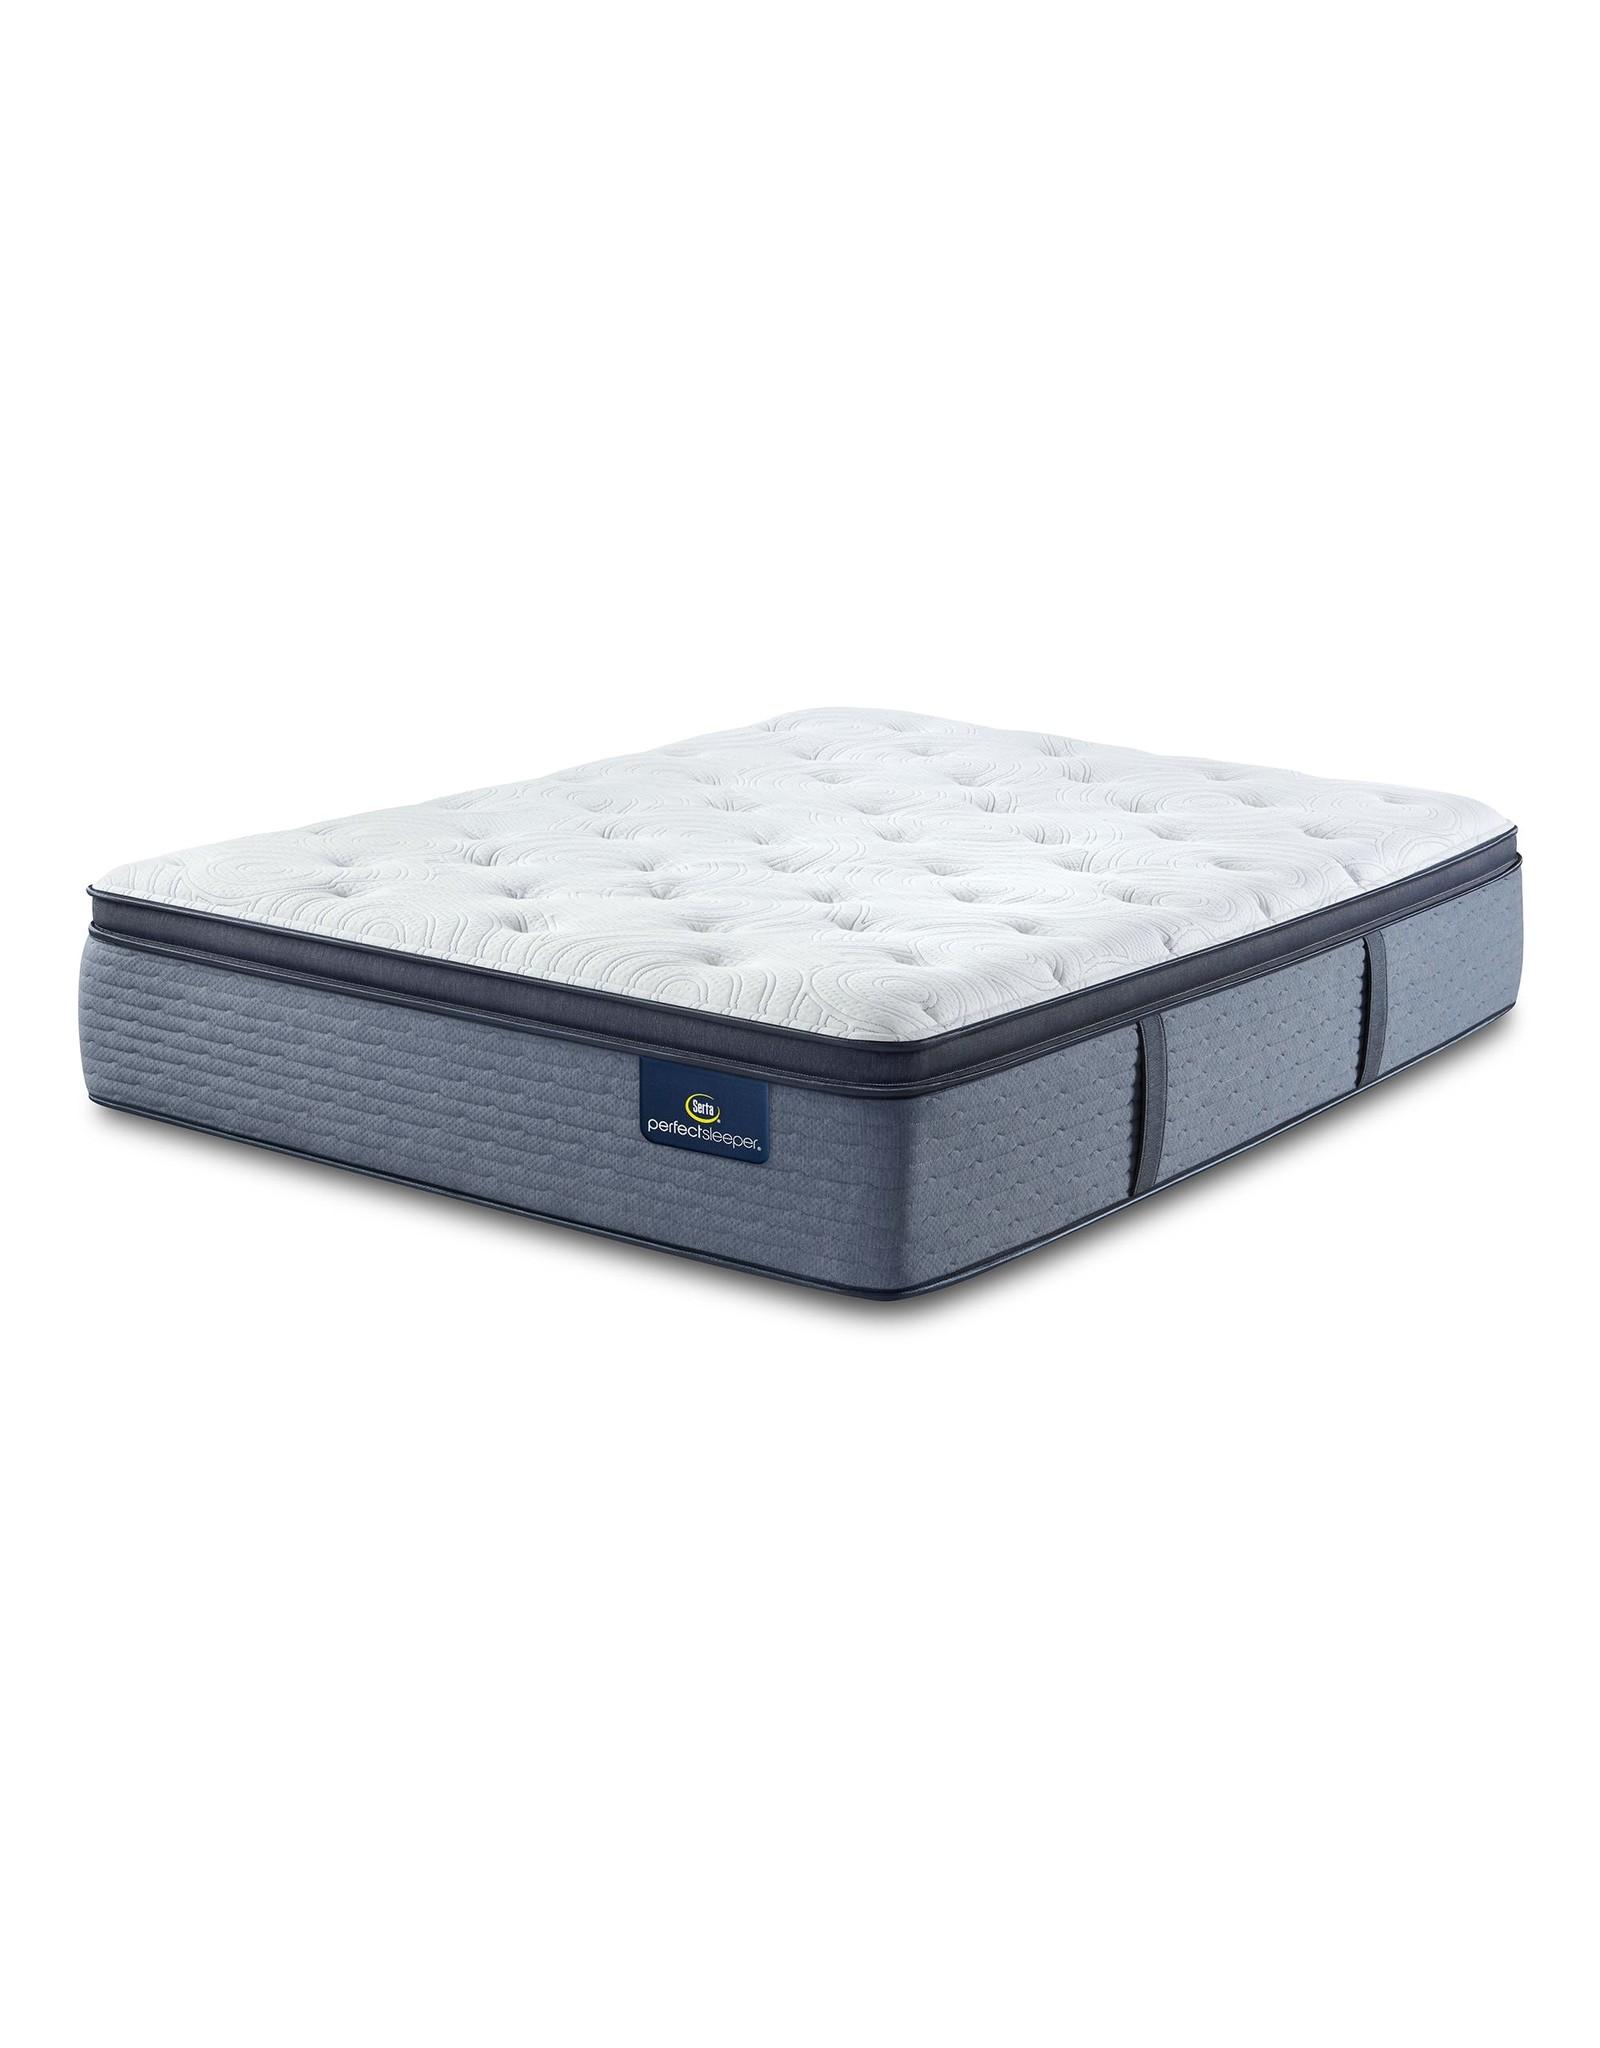 Renewed Night Renewed Night Firm Pillow Top King Mattress